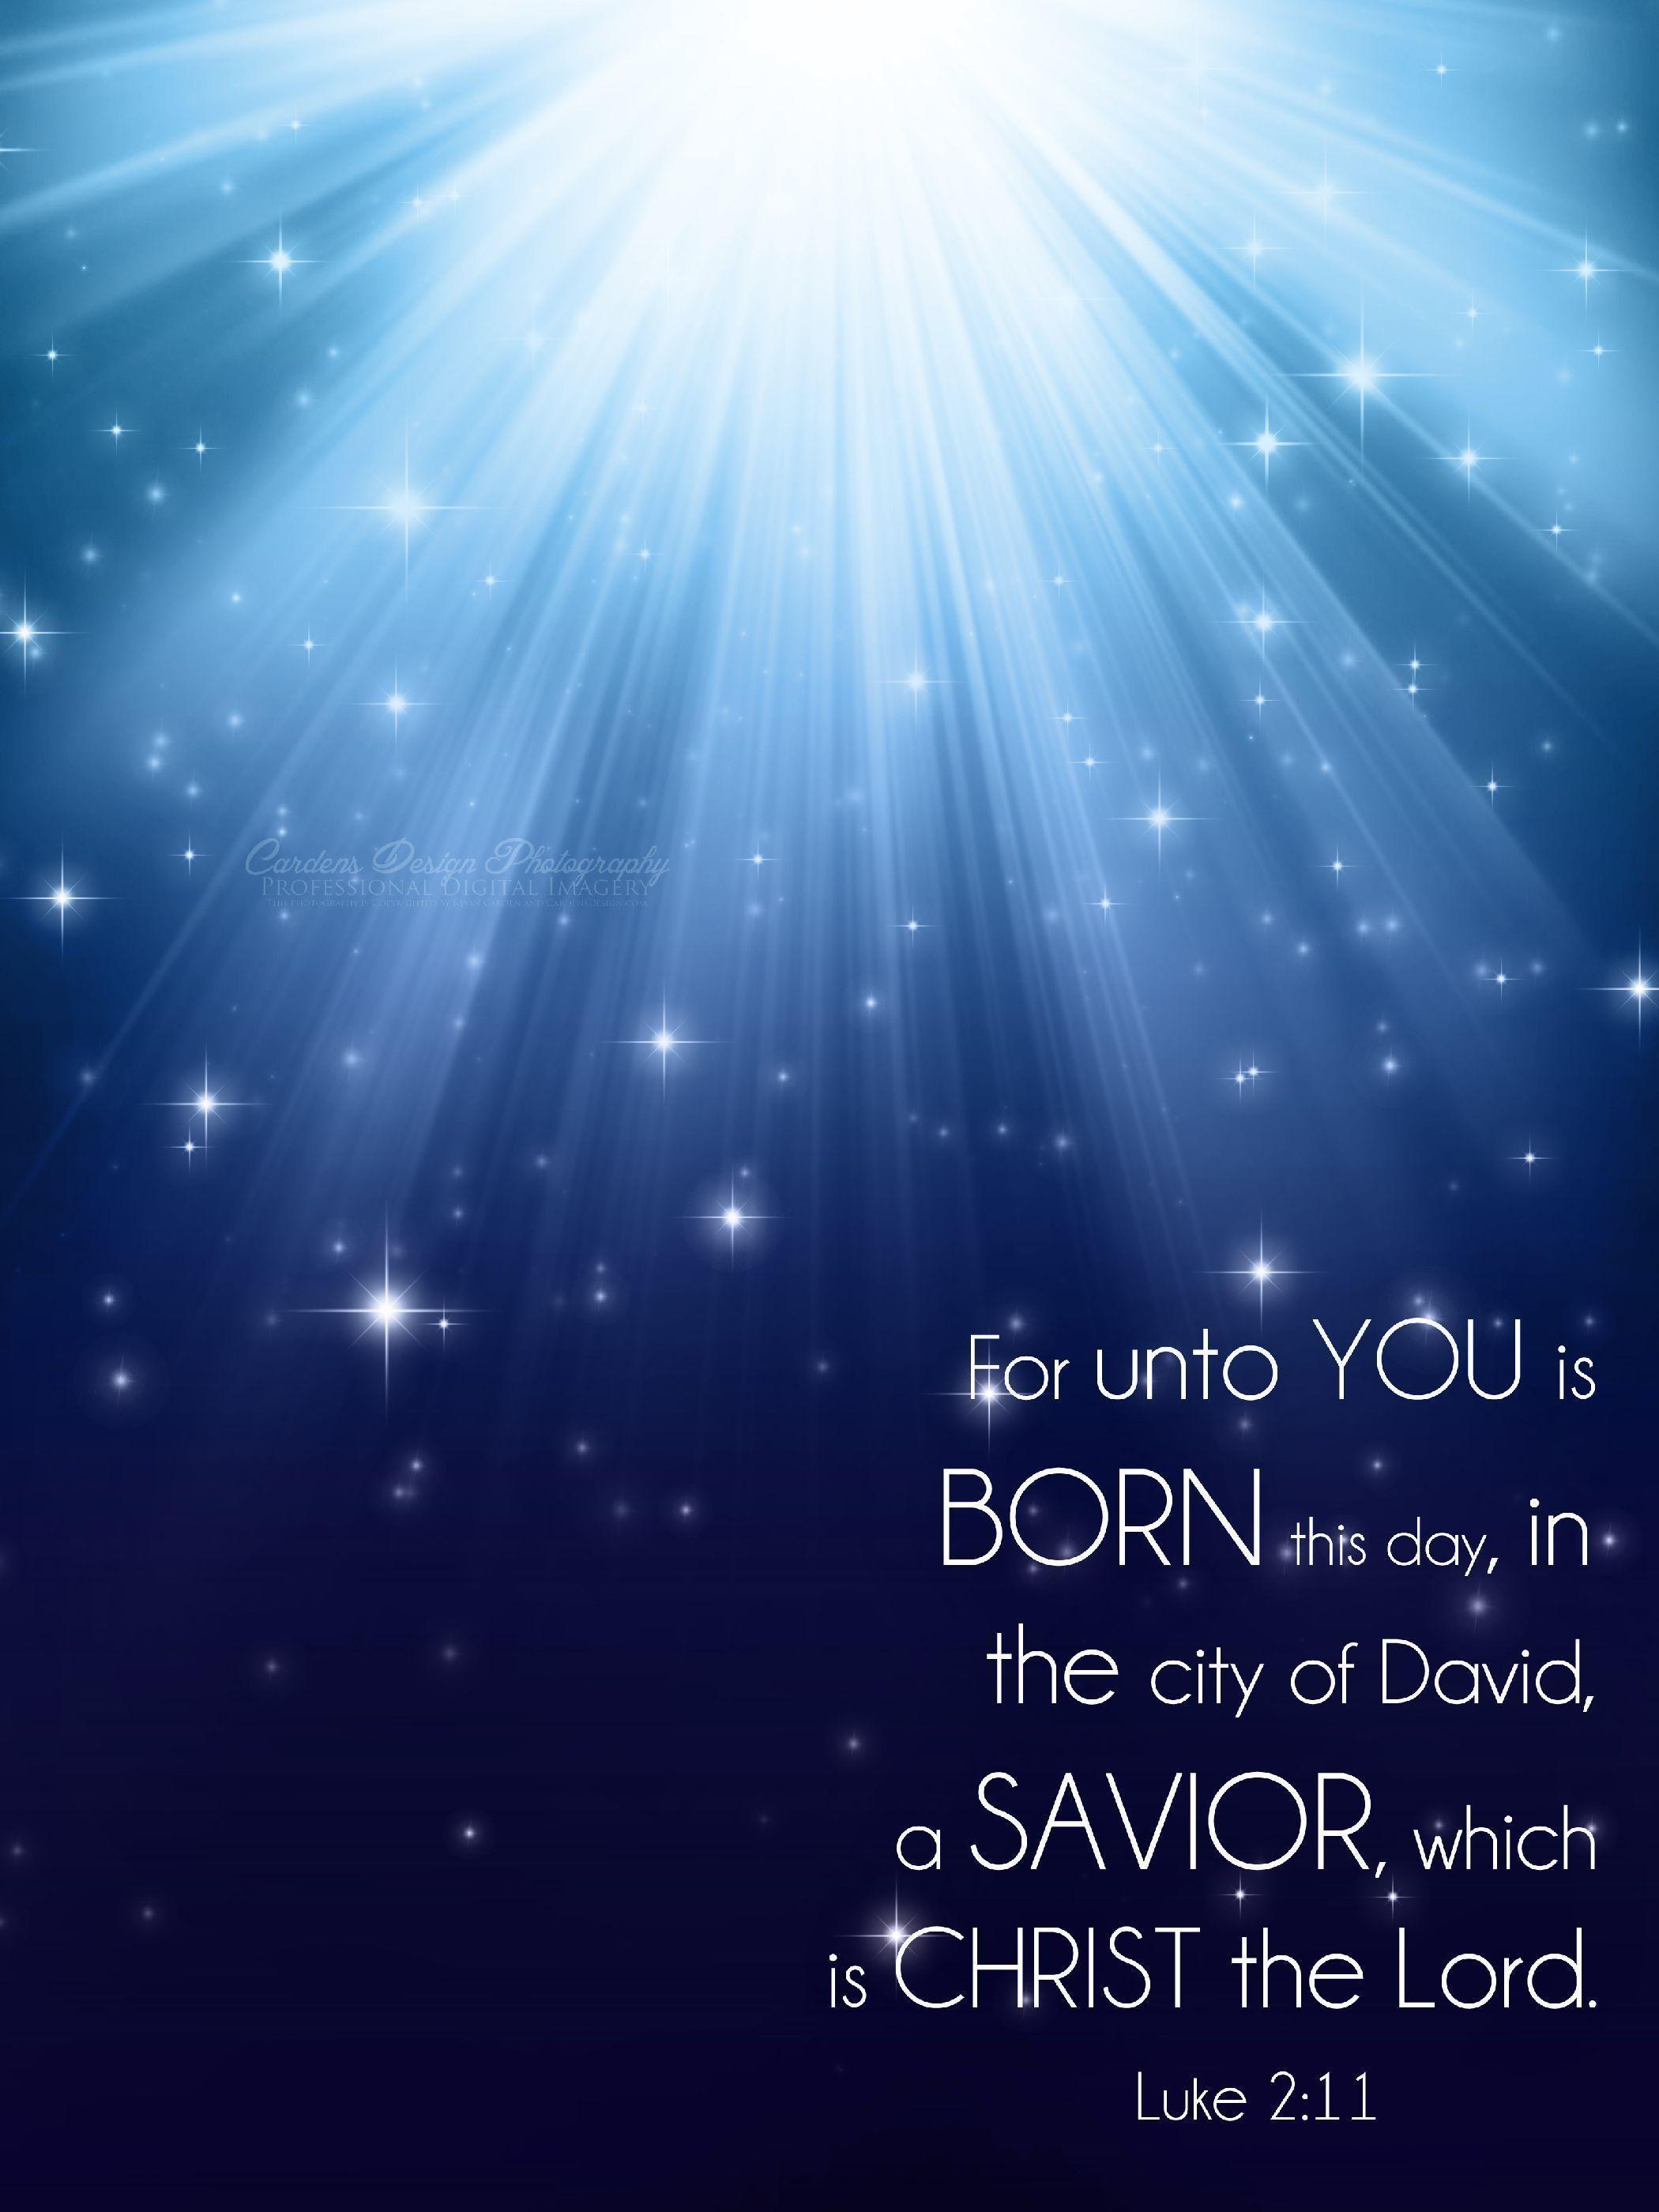 Christian Christmas Desktop Wallpaper ·â'